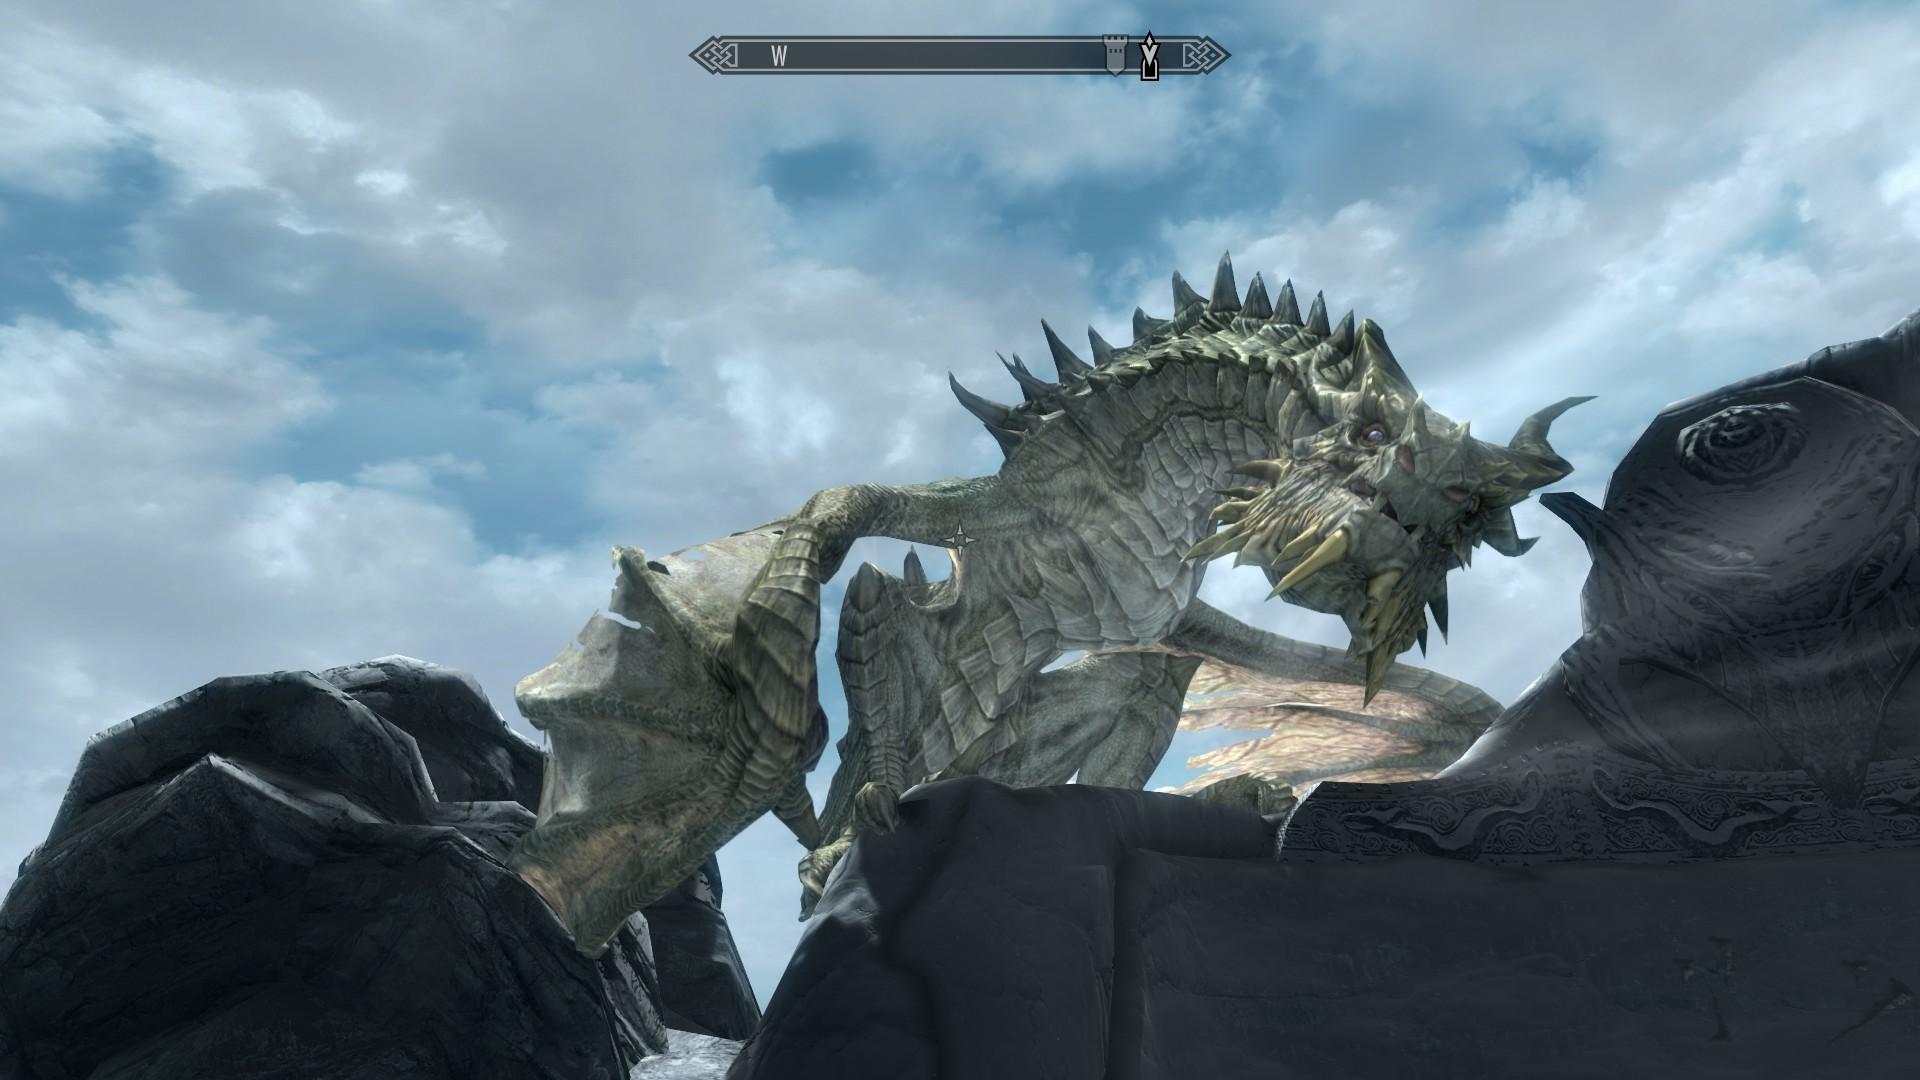 20180603133103_1.jpg - Elder Scrolls 5: Skyrim, the